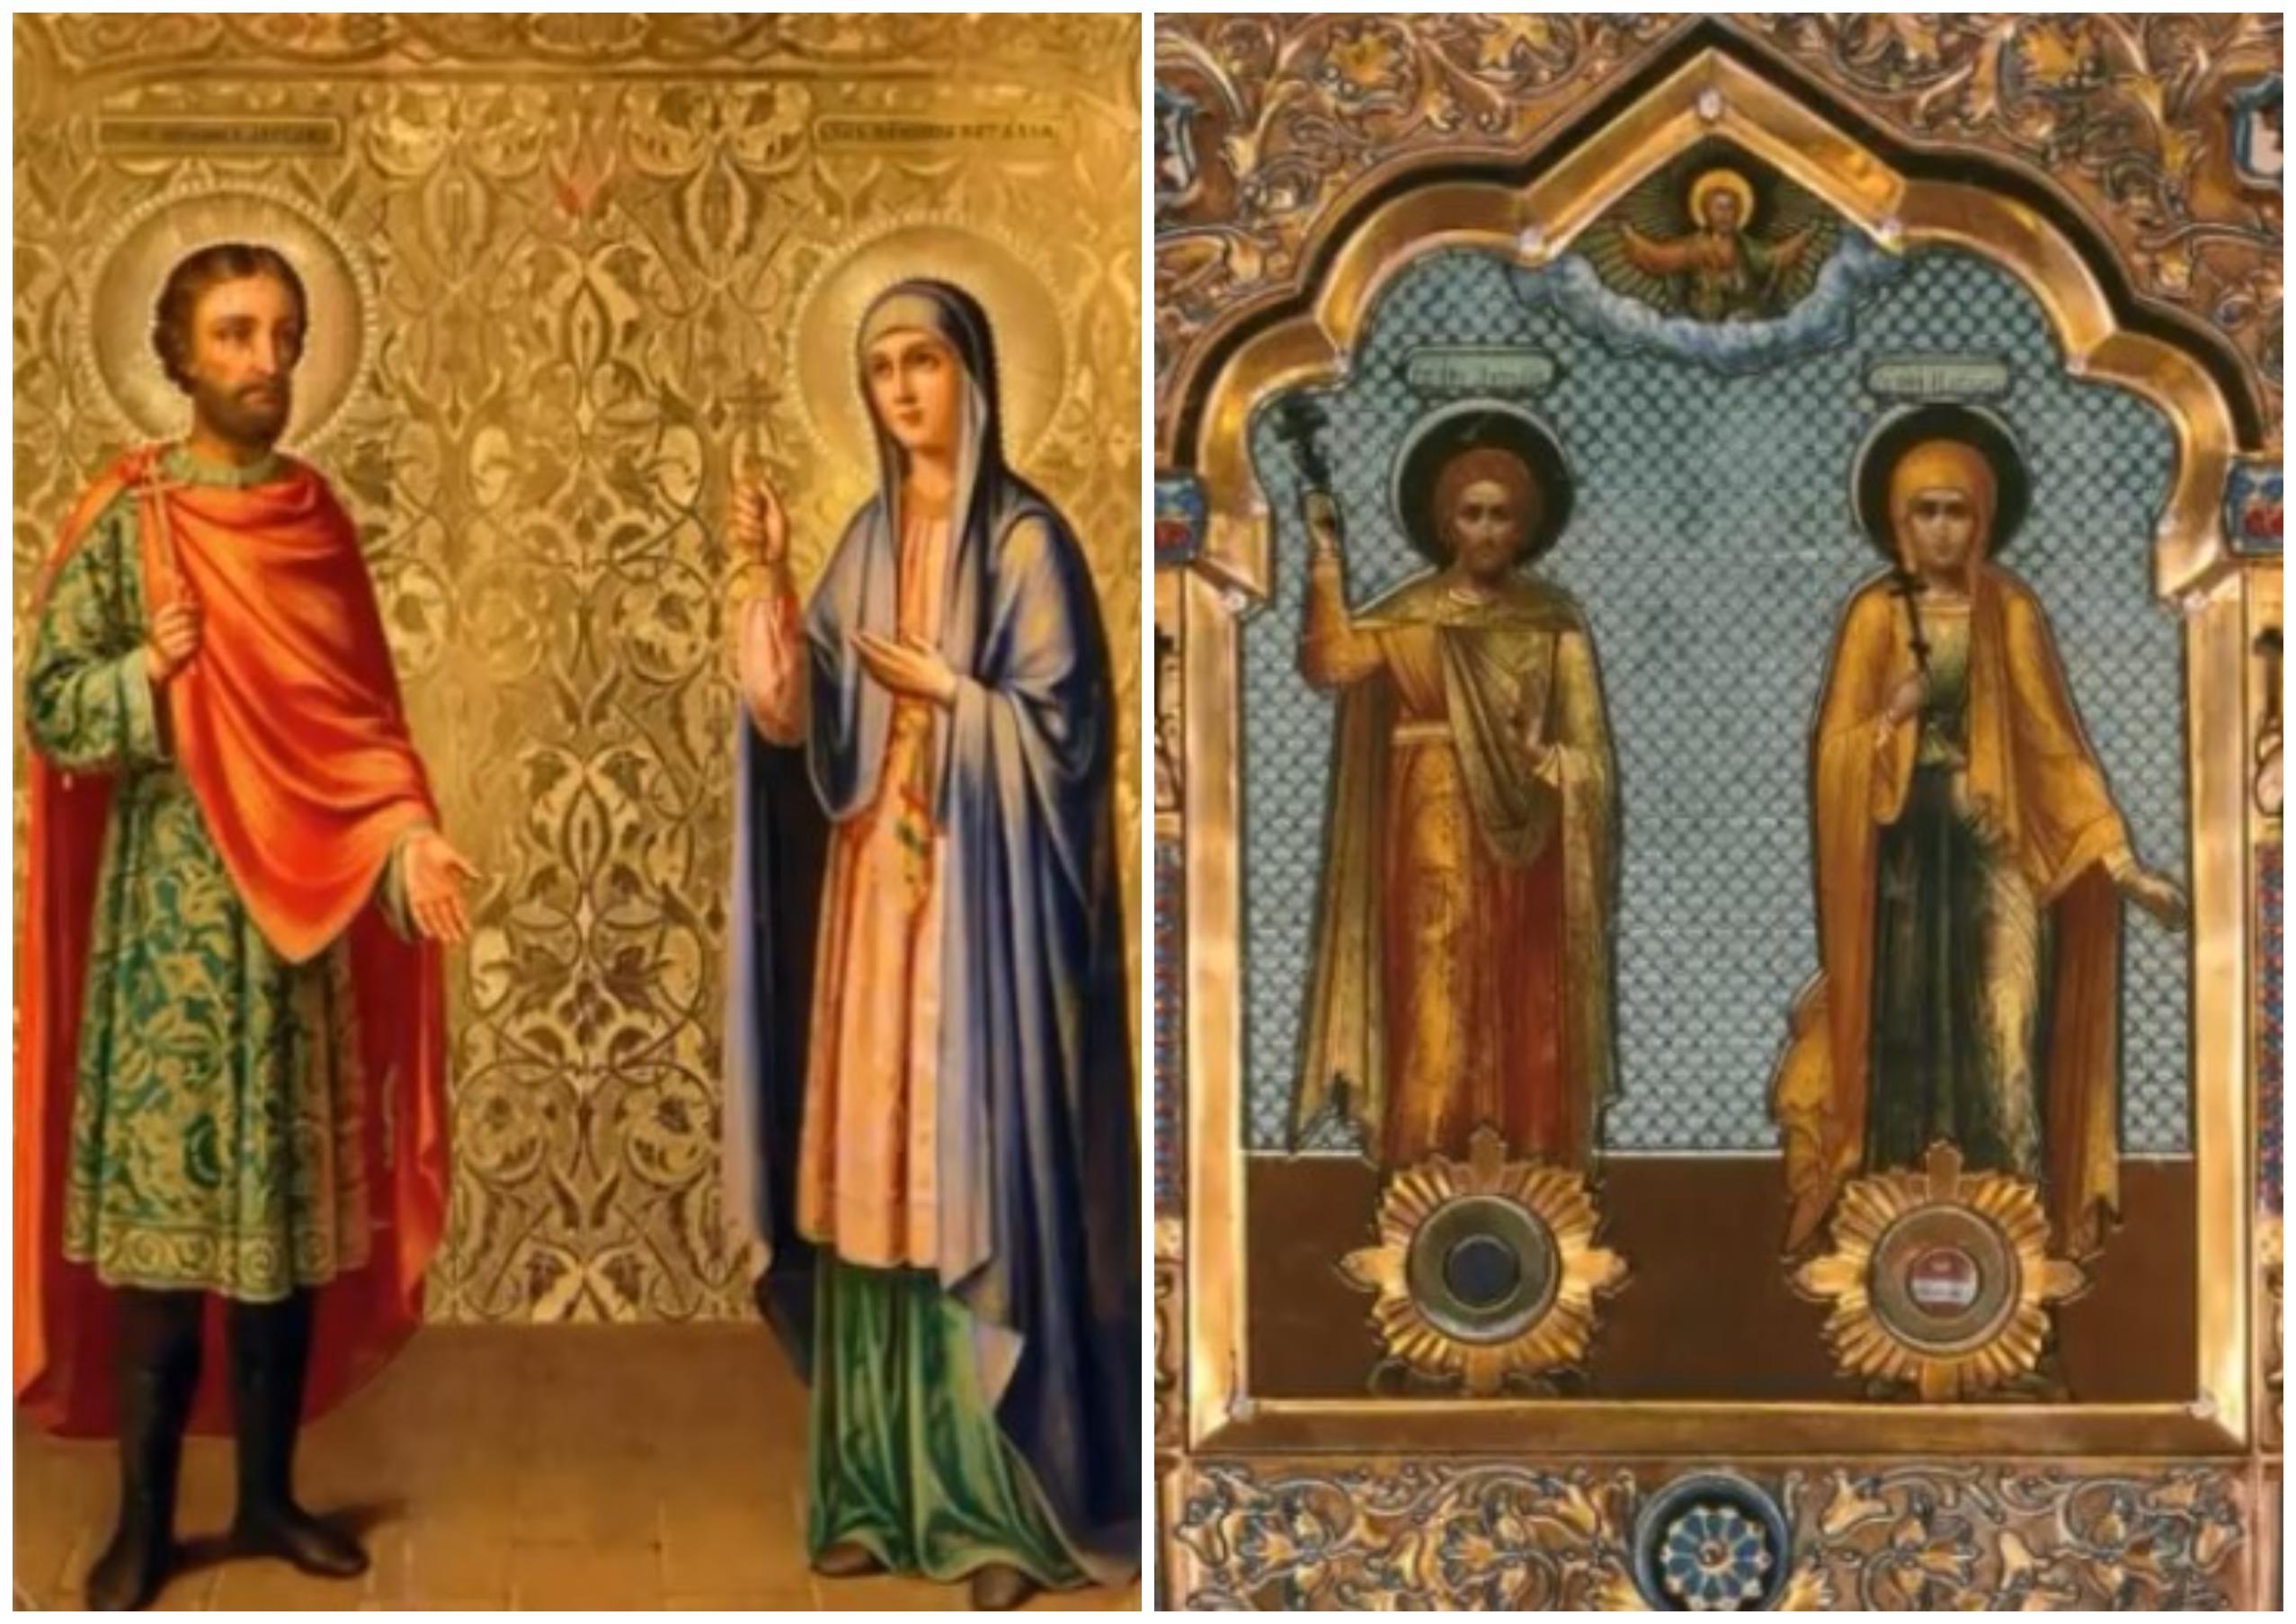 На фото изображены святые Наталия и Андриан.